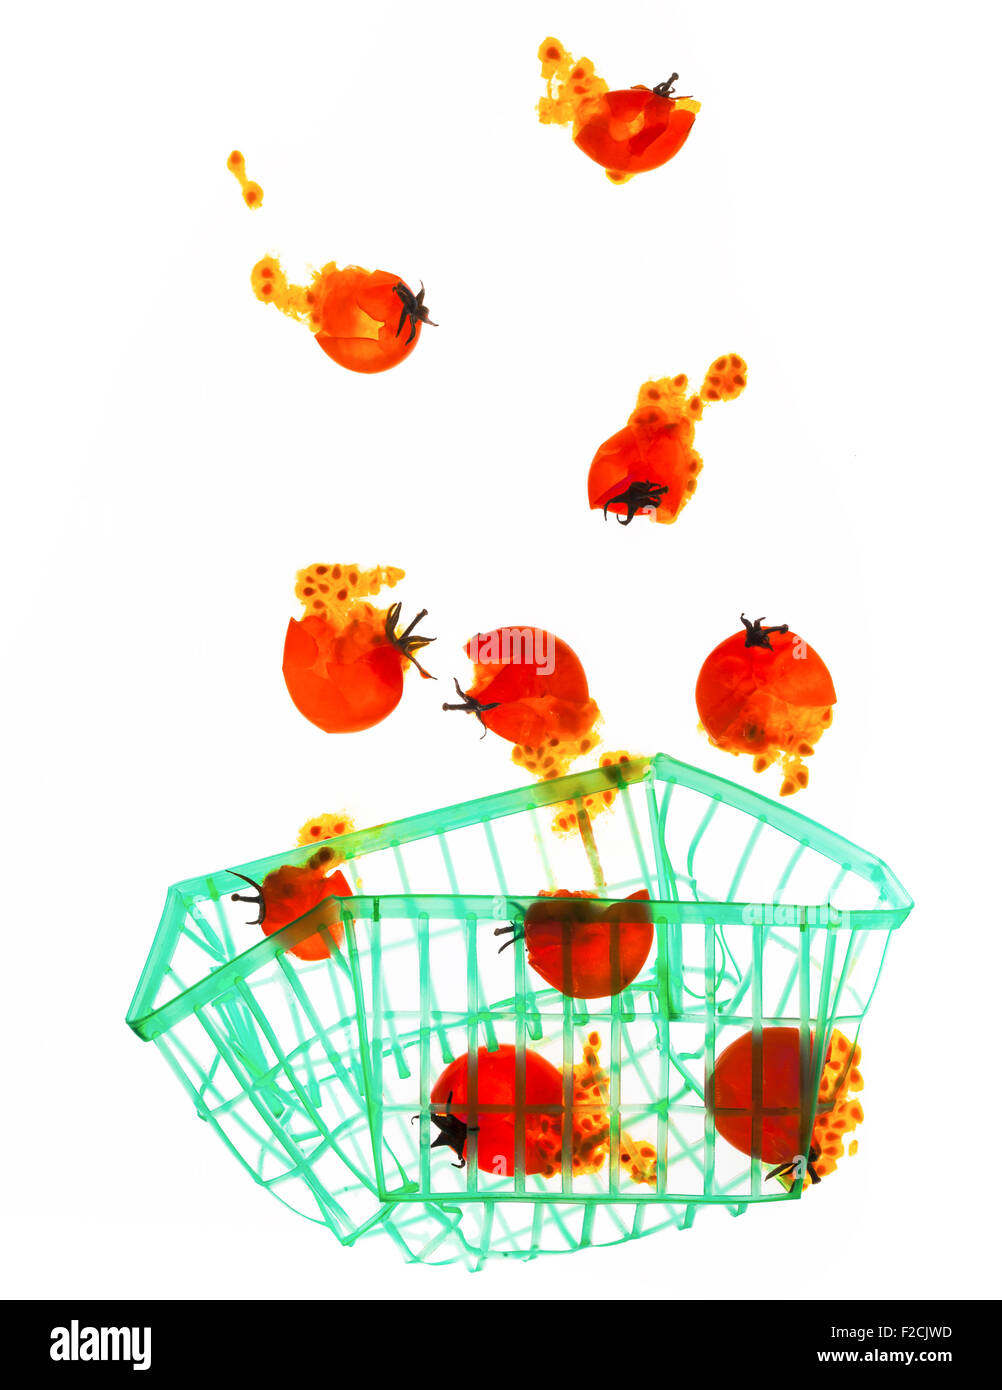 Smashed tomates cherry emergen de un cartón verde de plástico aplanado Imagen De Stock